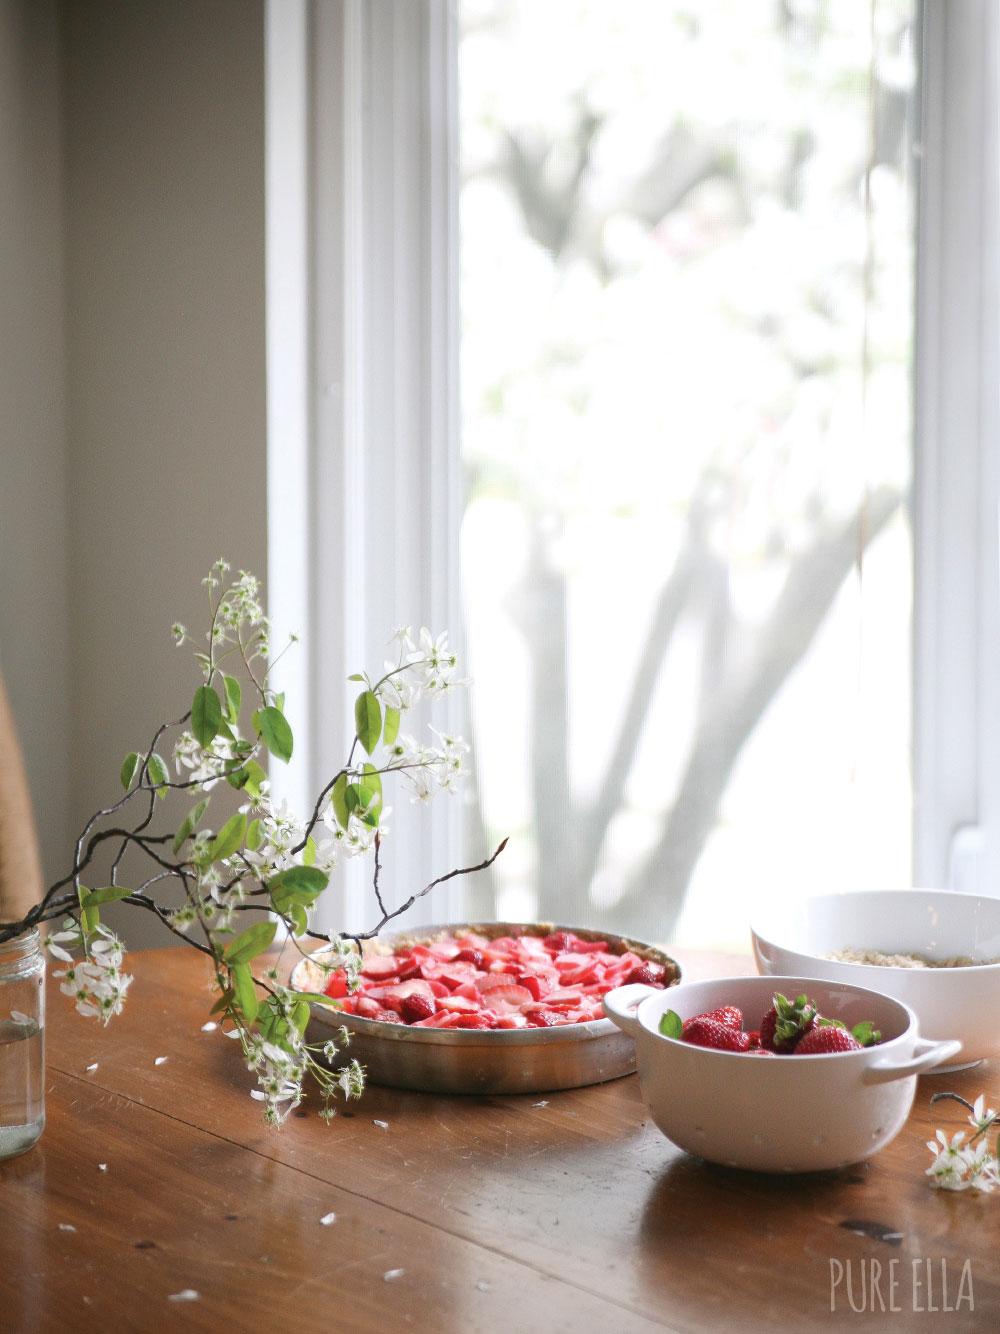 Pure-Ella-Gluten-free-vegan-Strawberry-Rhubarb-Crumble-Pie8